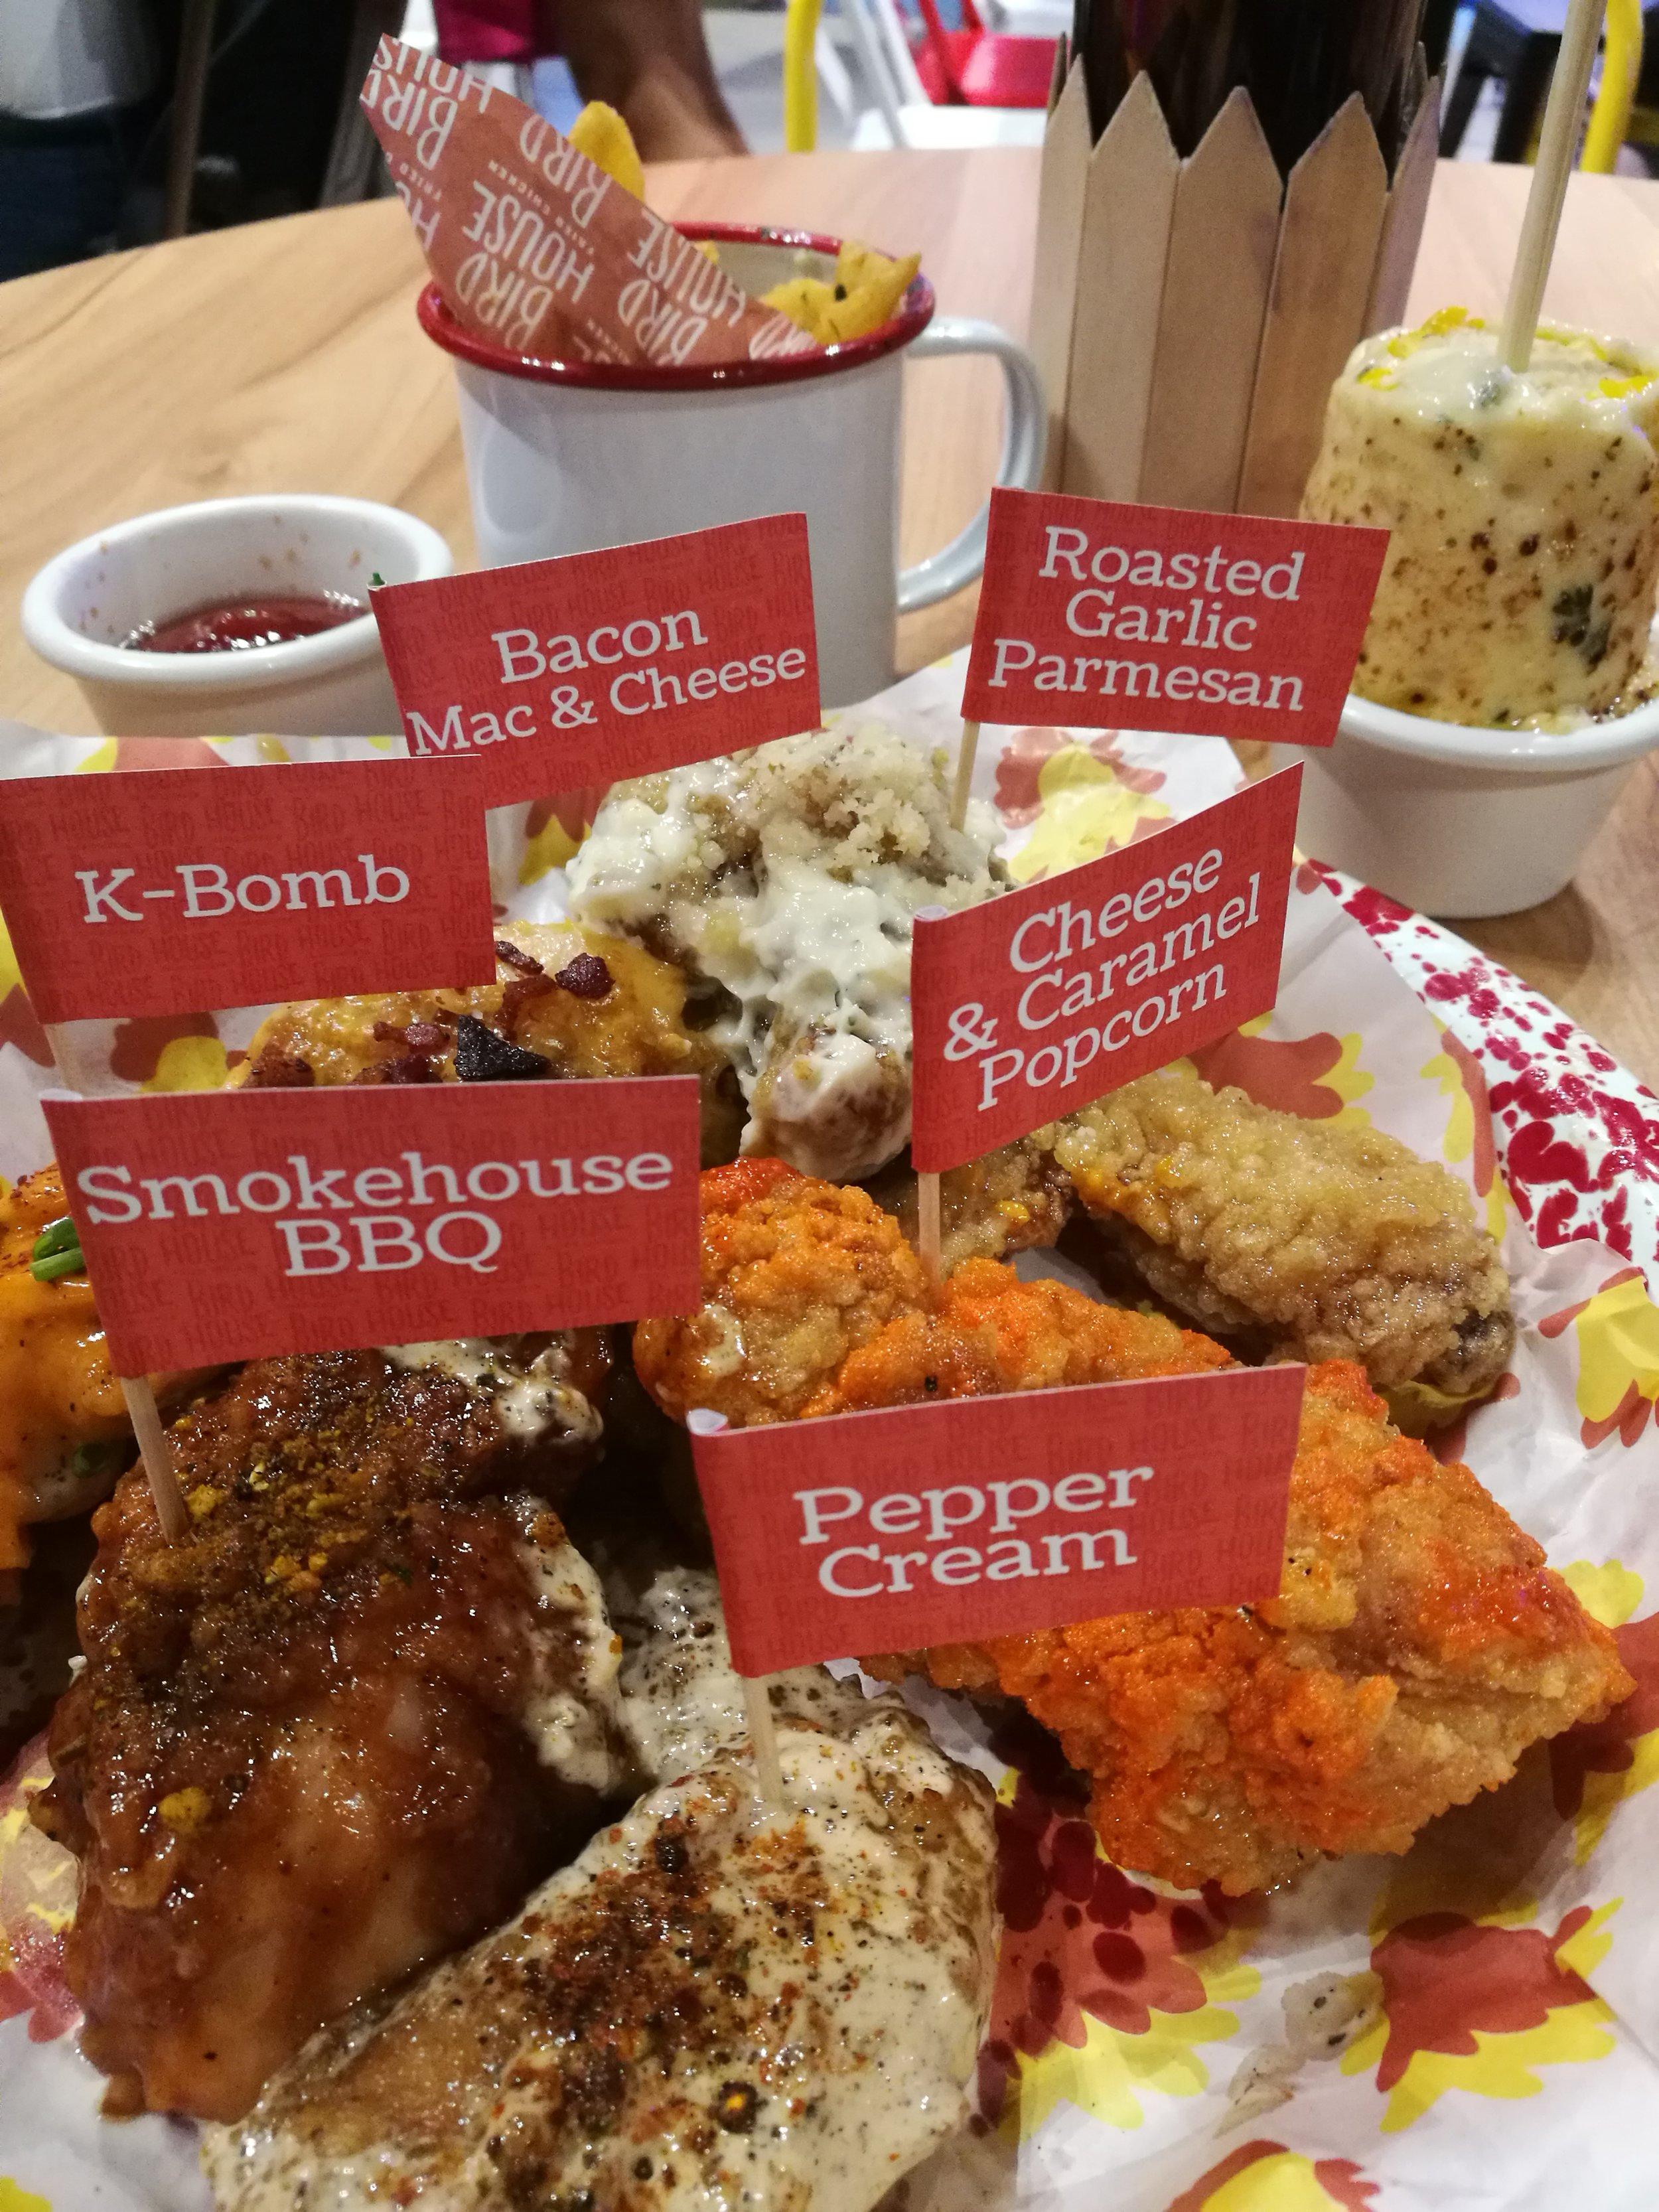 Wing platter at the Birdhouse food sampling